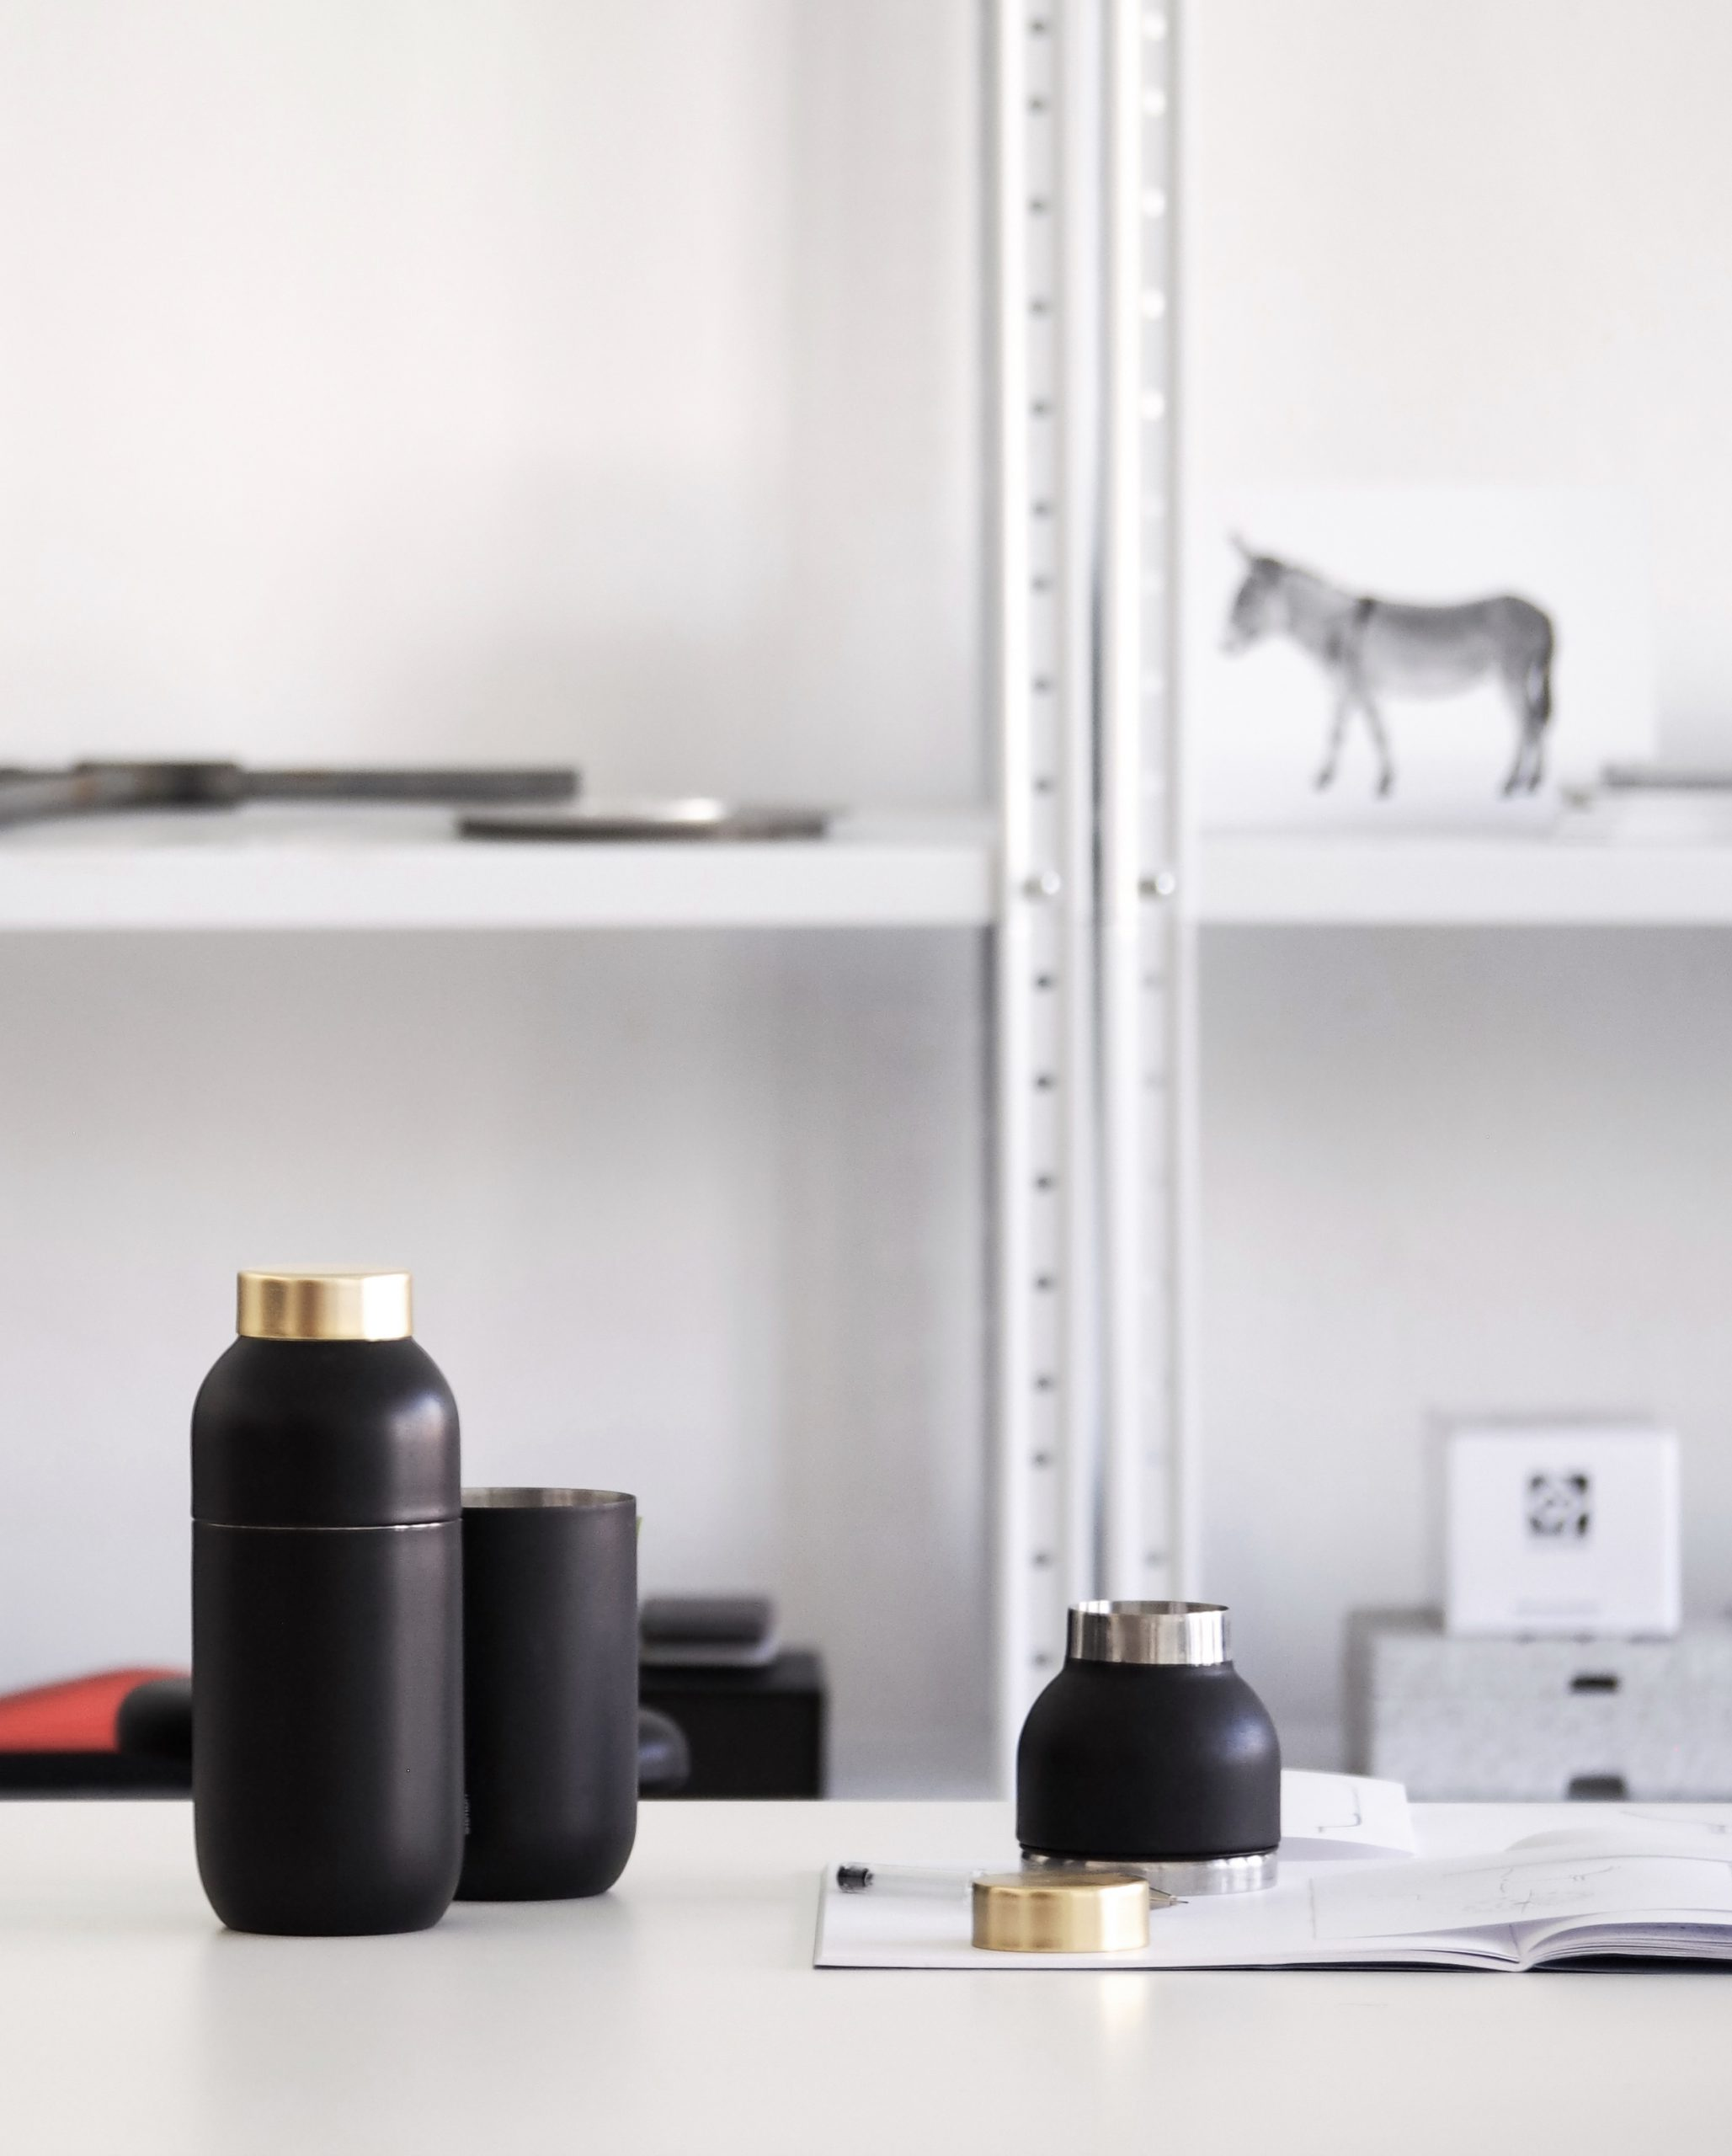 Studio shot of the Collar bar set by Debiasi Sandri for Stelton